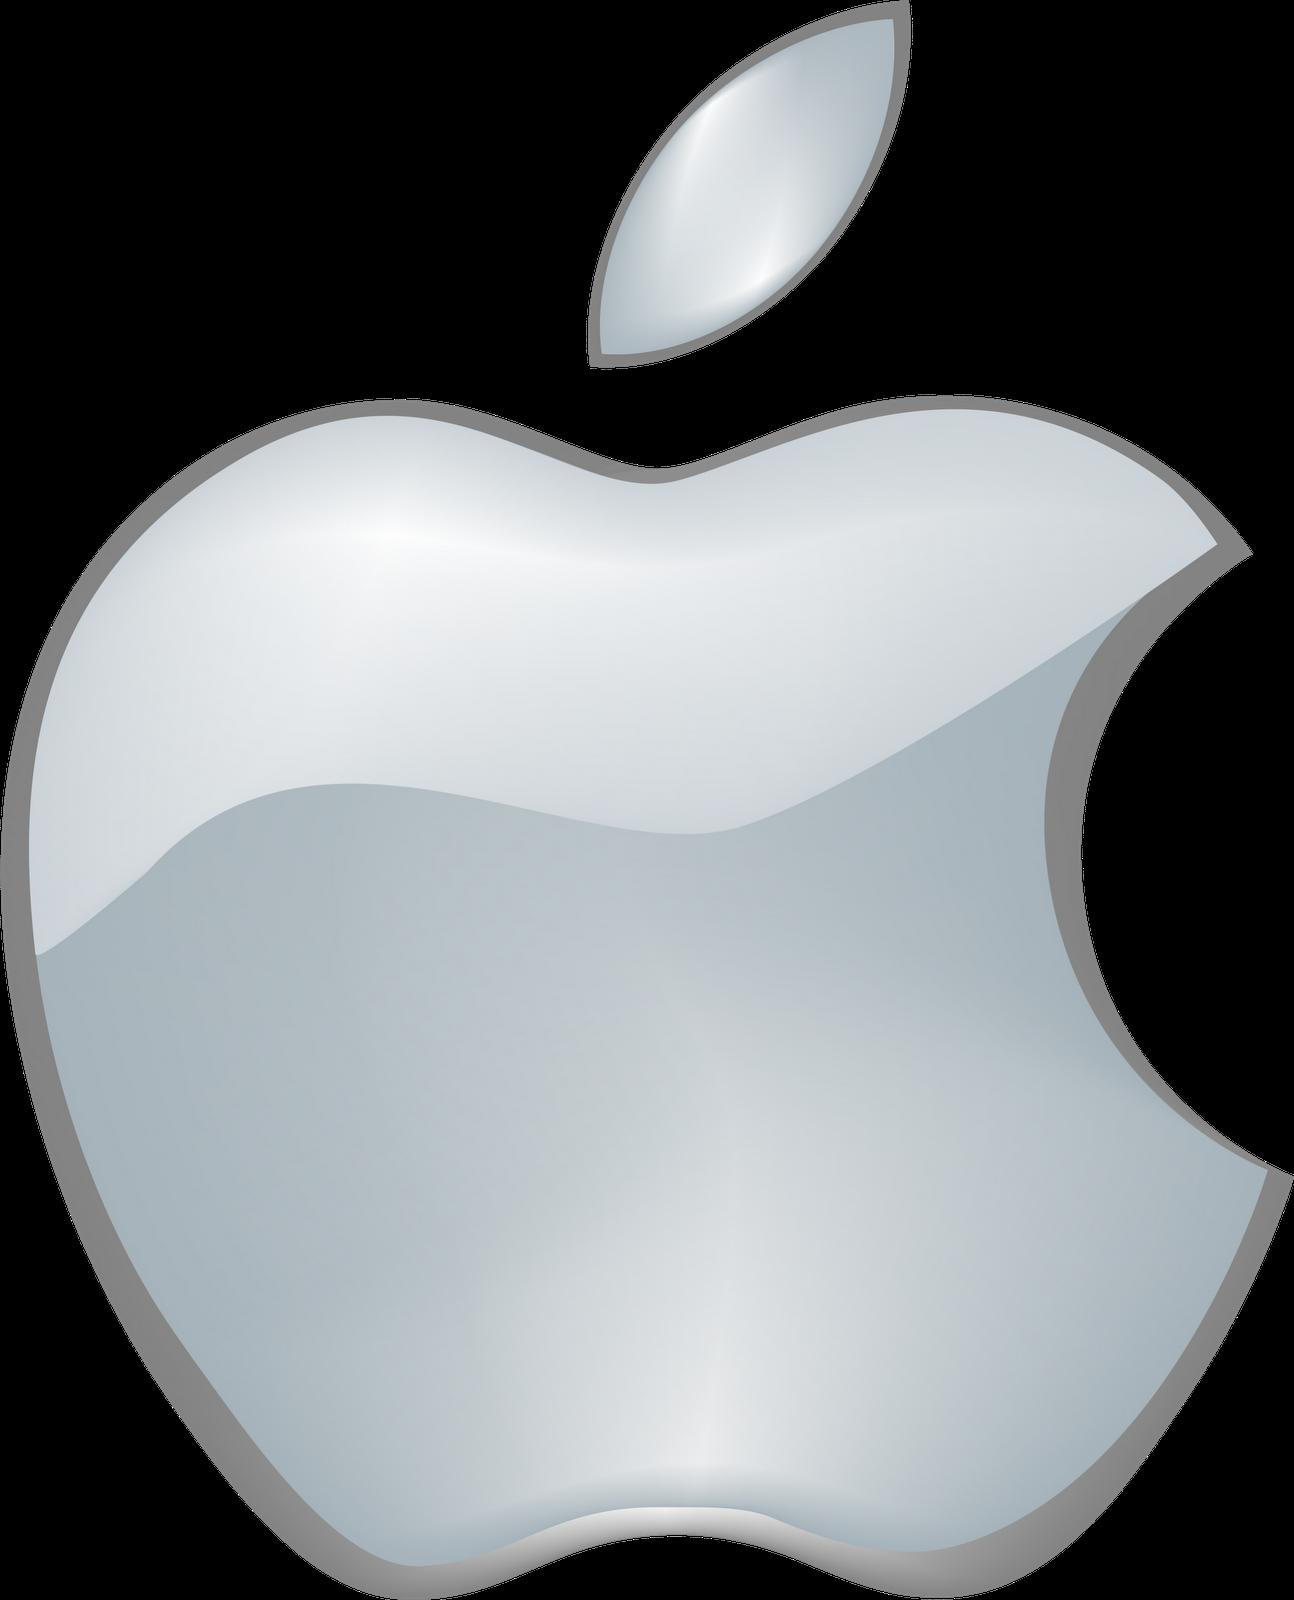 Apple Inc. clipart apple iphone #8